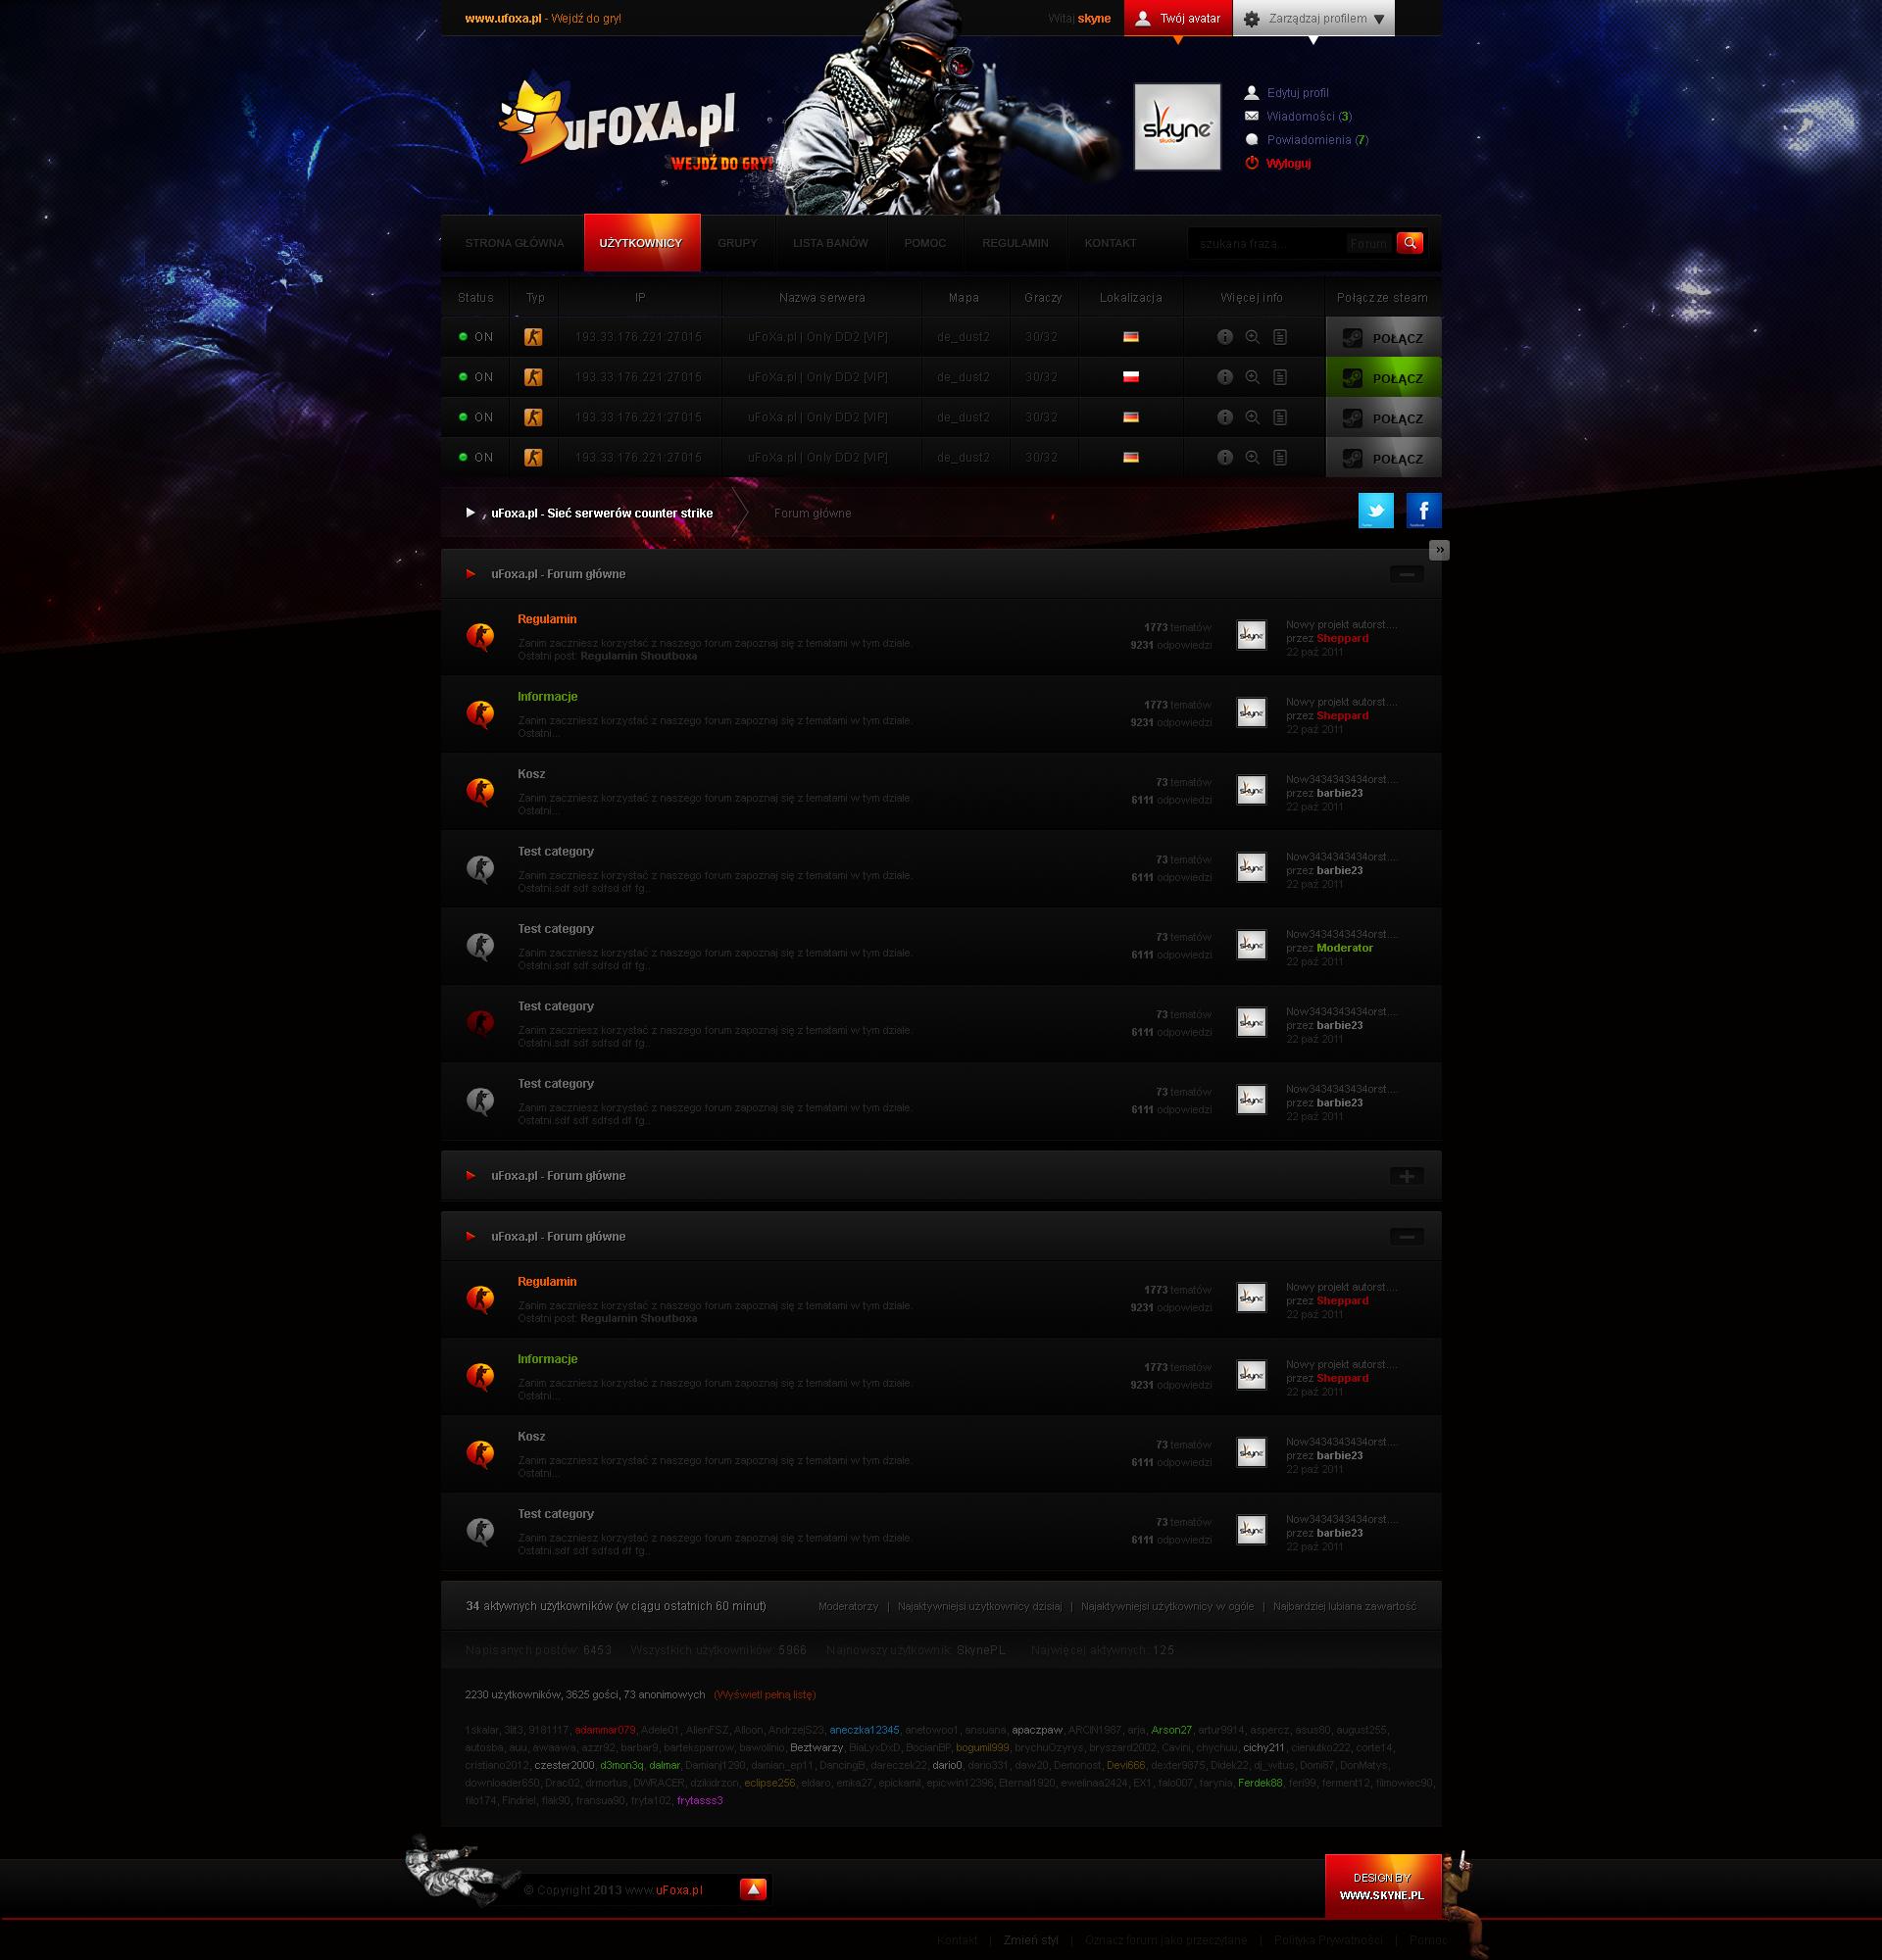 uFoxa - Counter strike forum layout by sheppard100